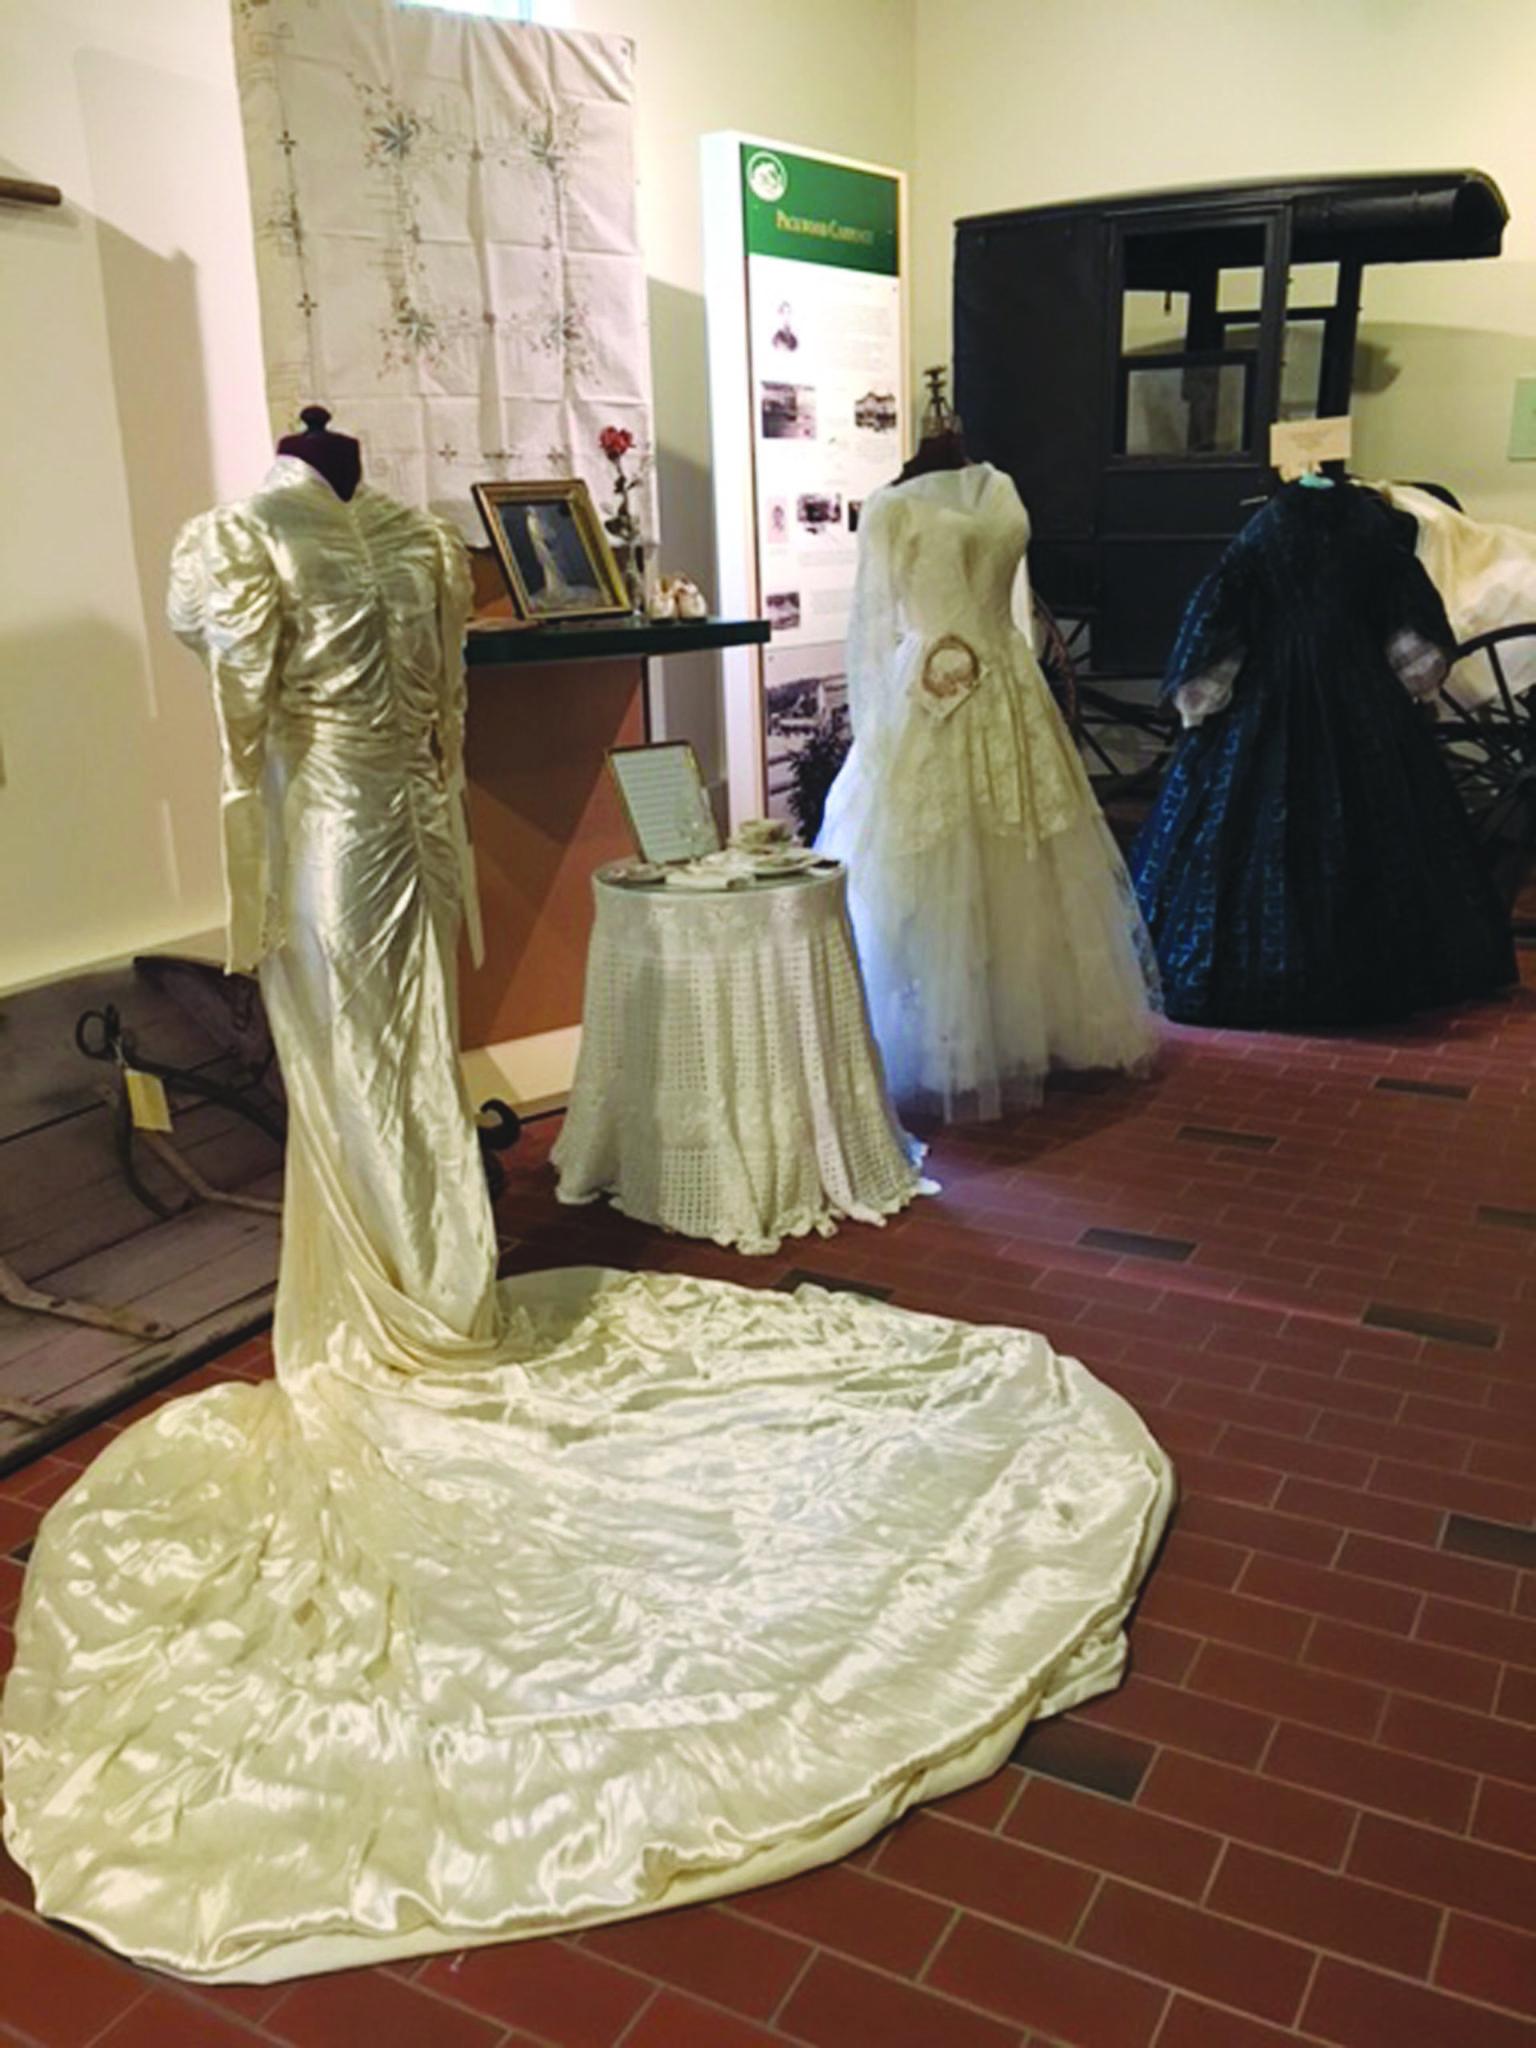 Historic wedding dresses on display